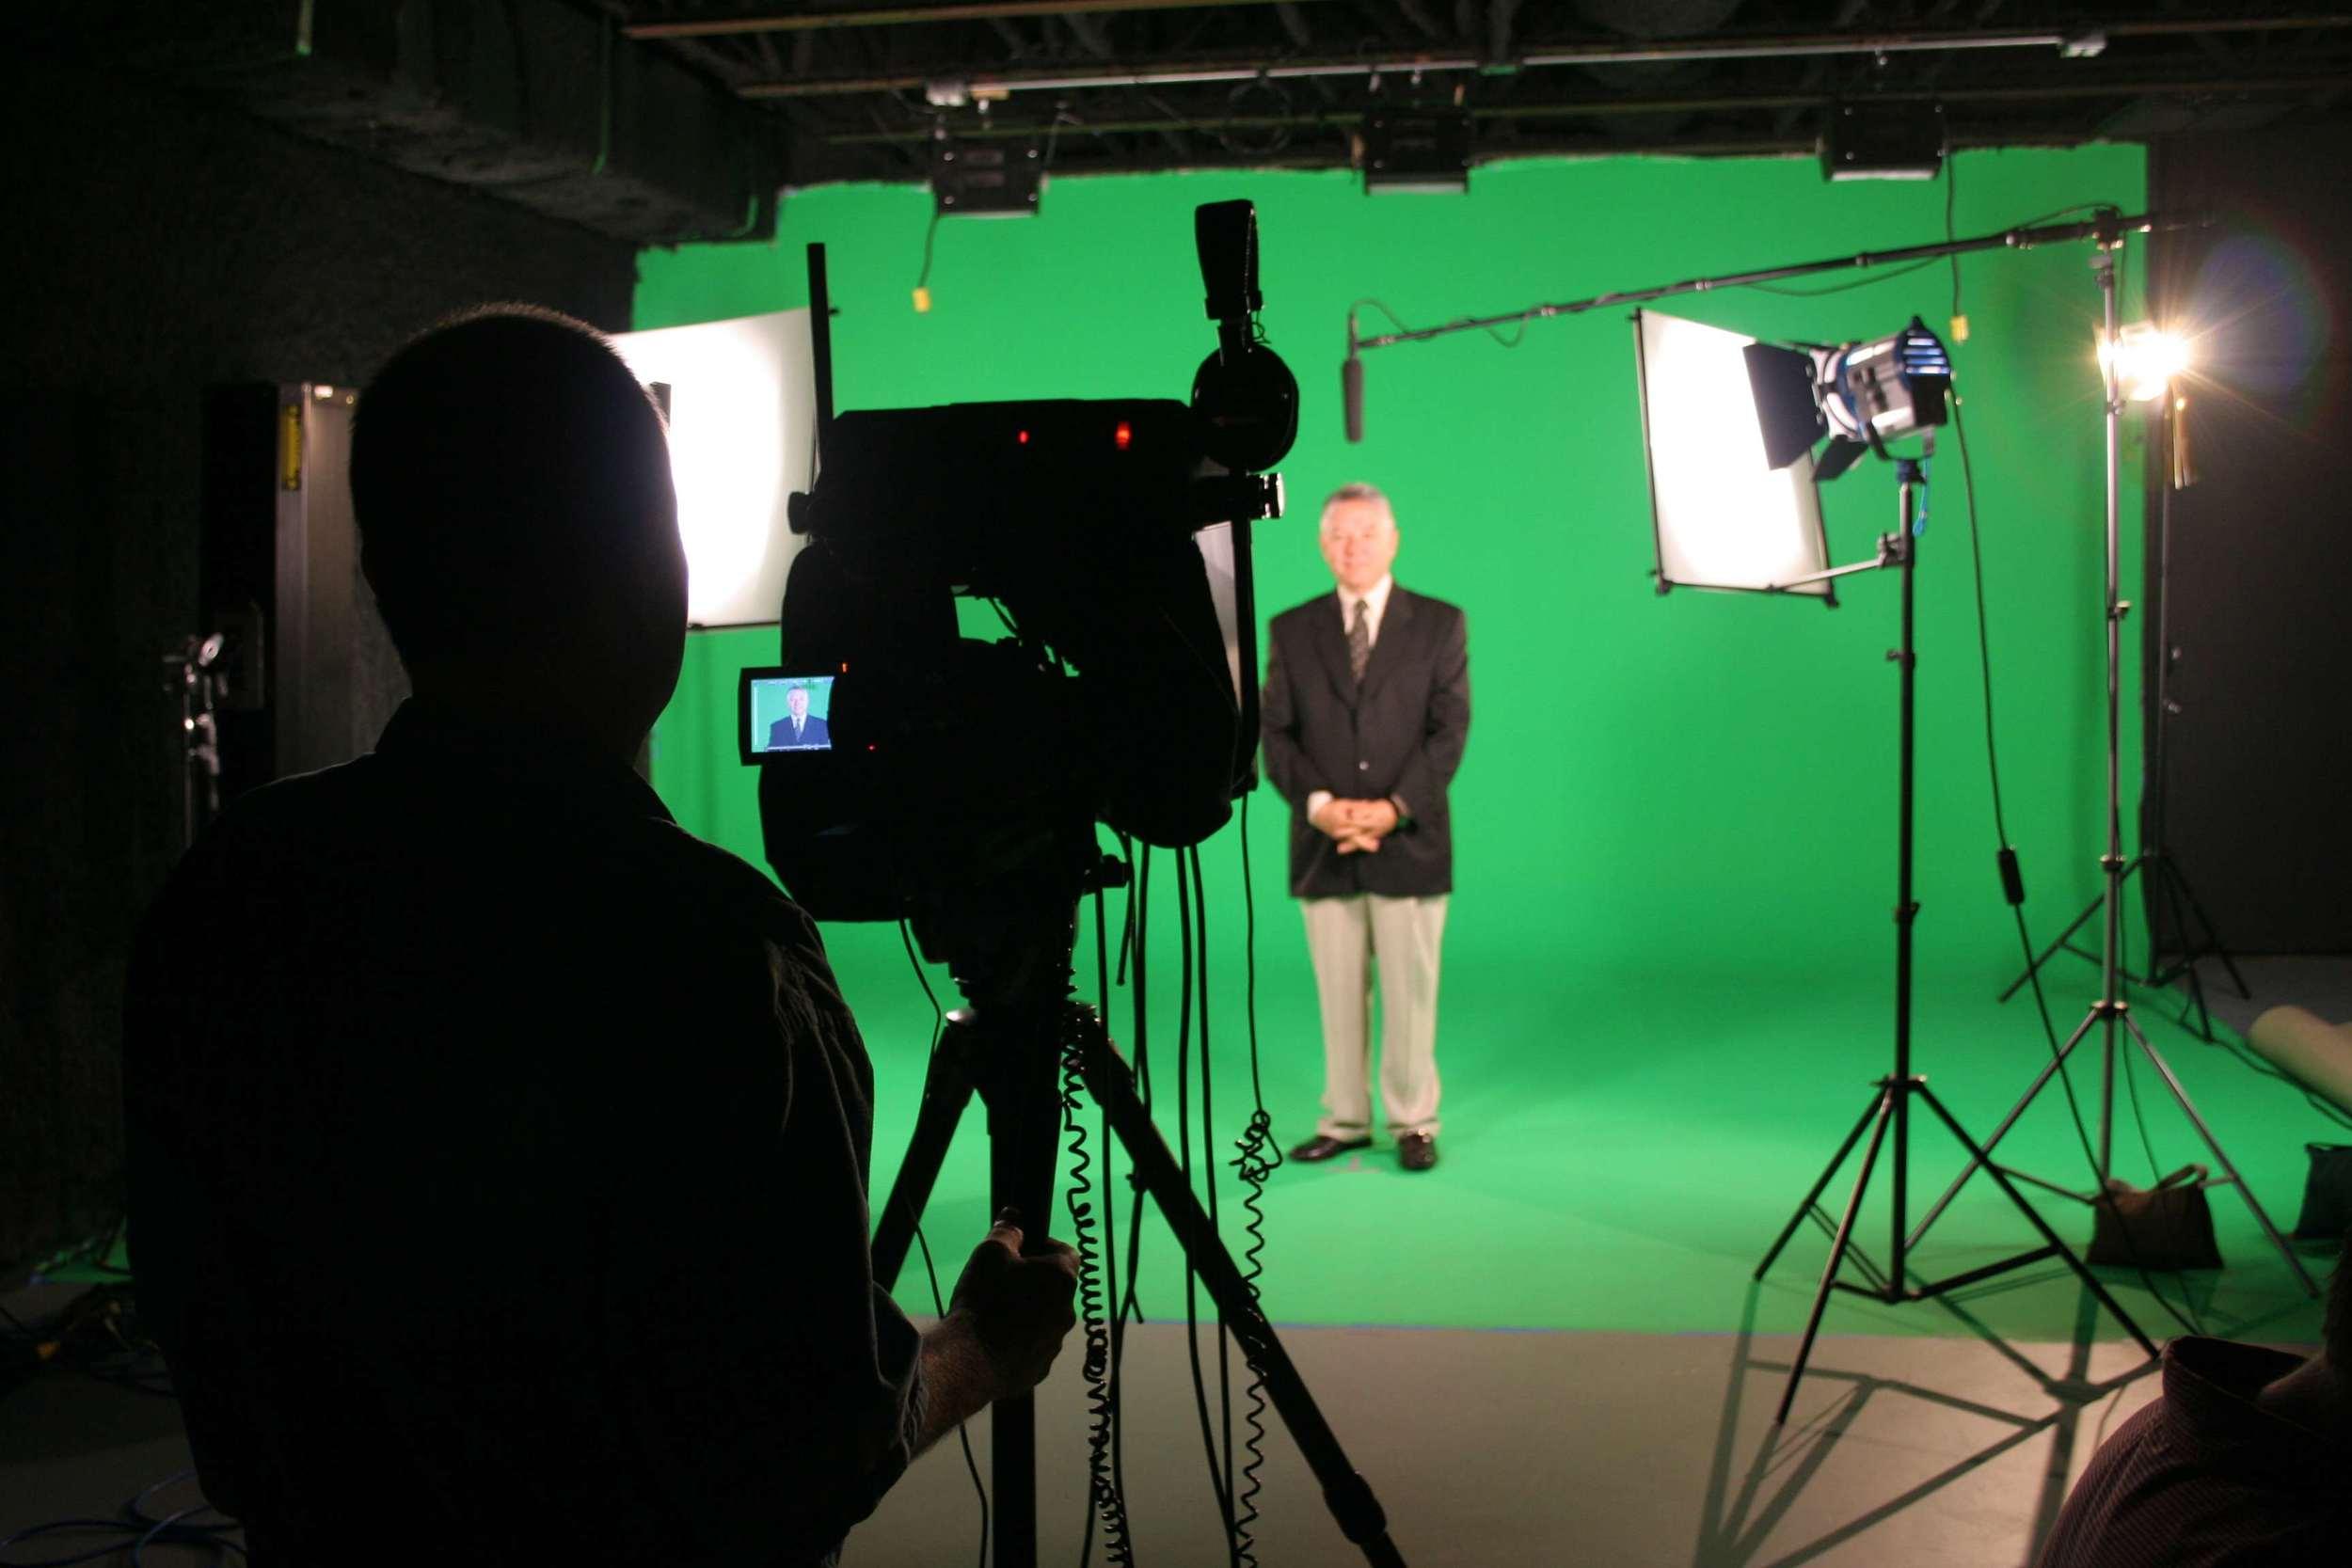 Scott from Whitney Media,Working with SunTrust on an internal video presentation.